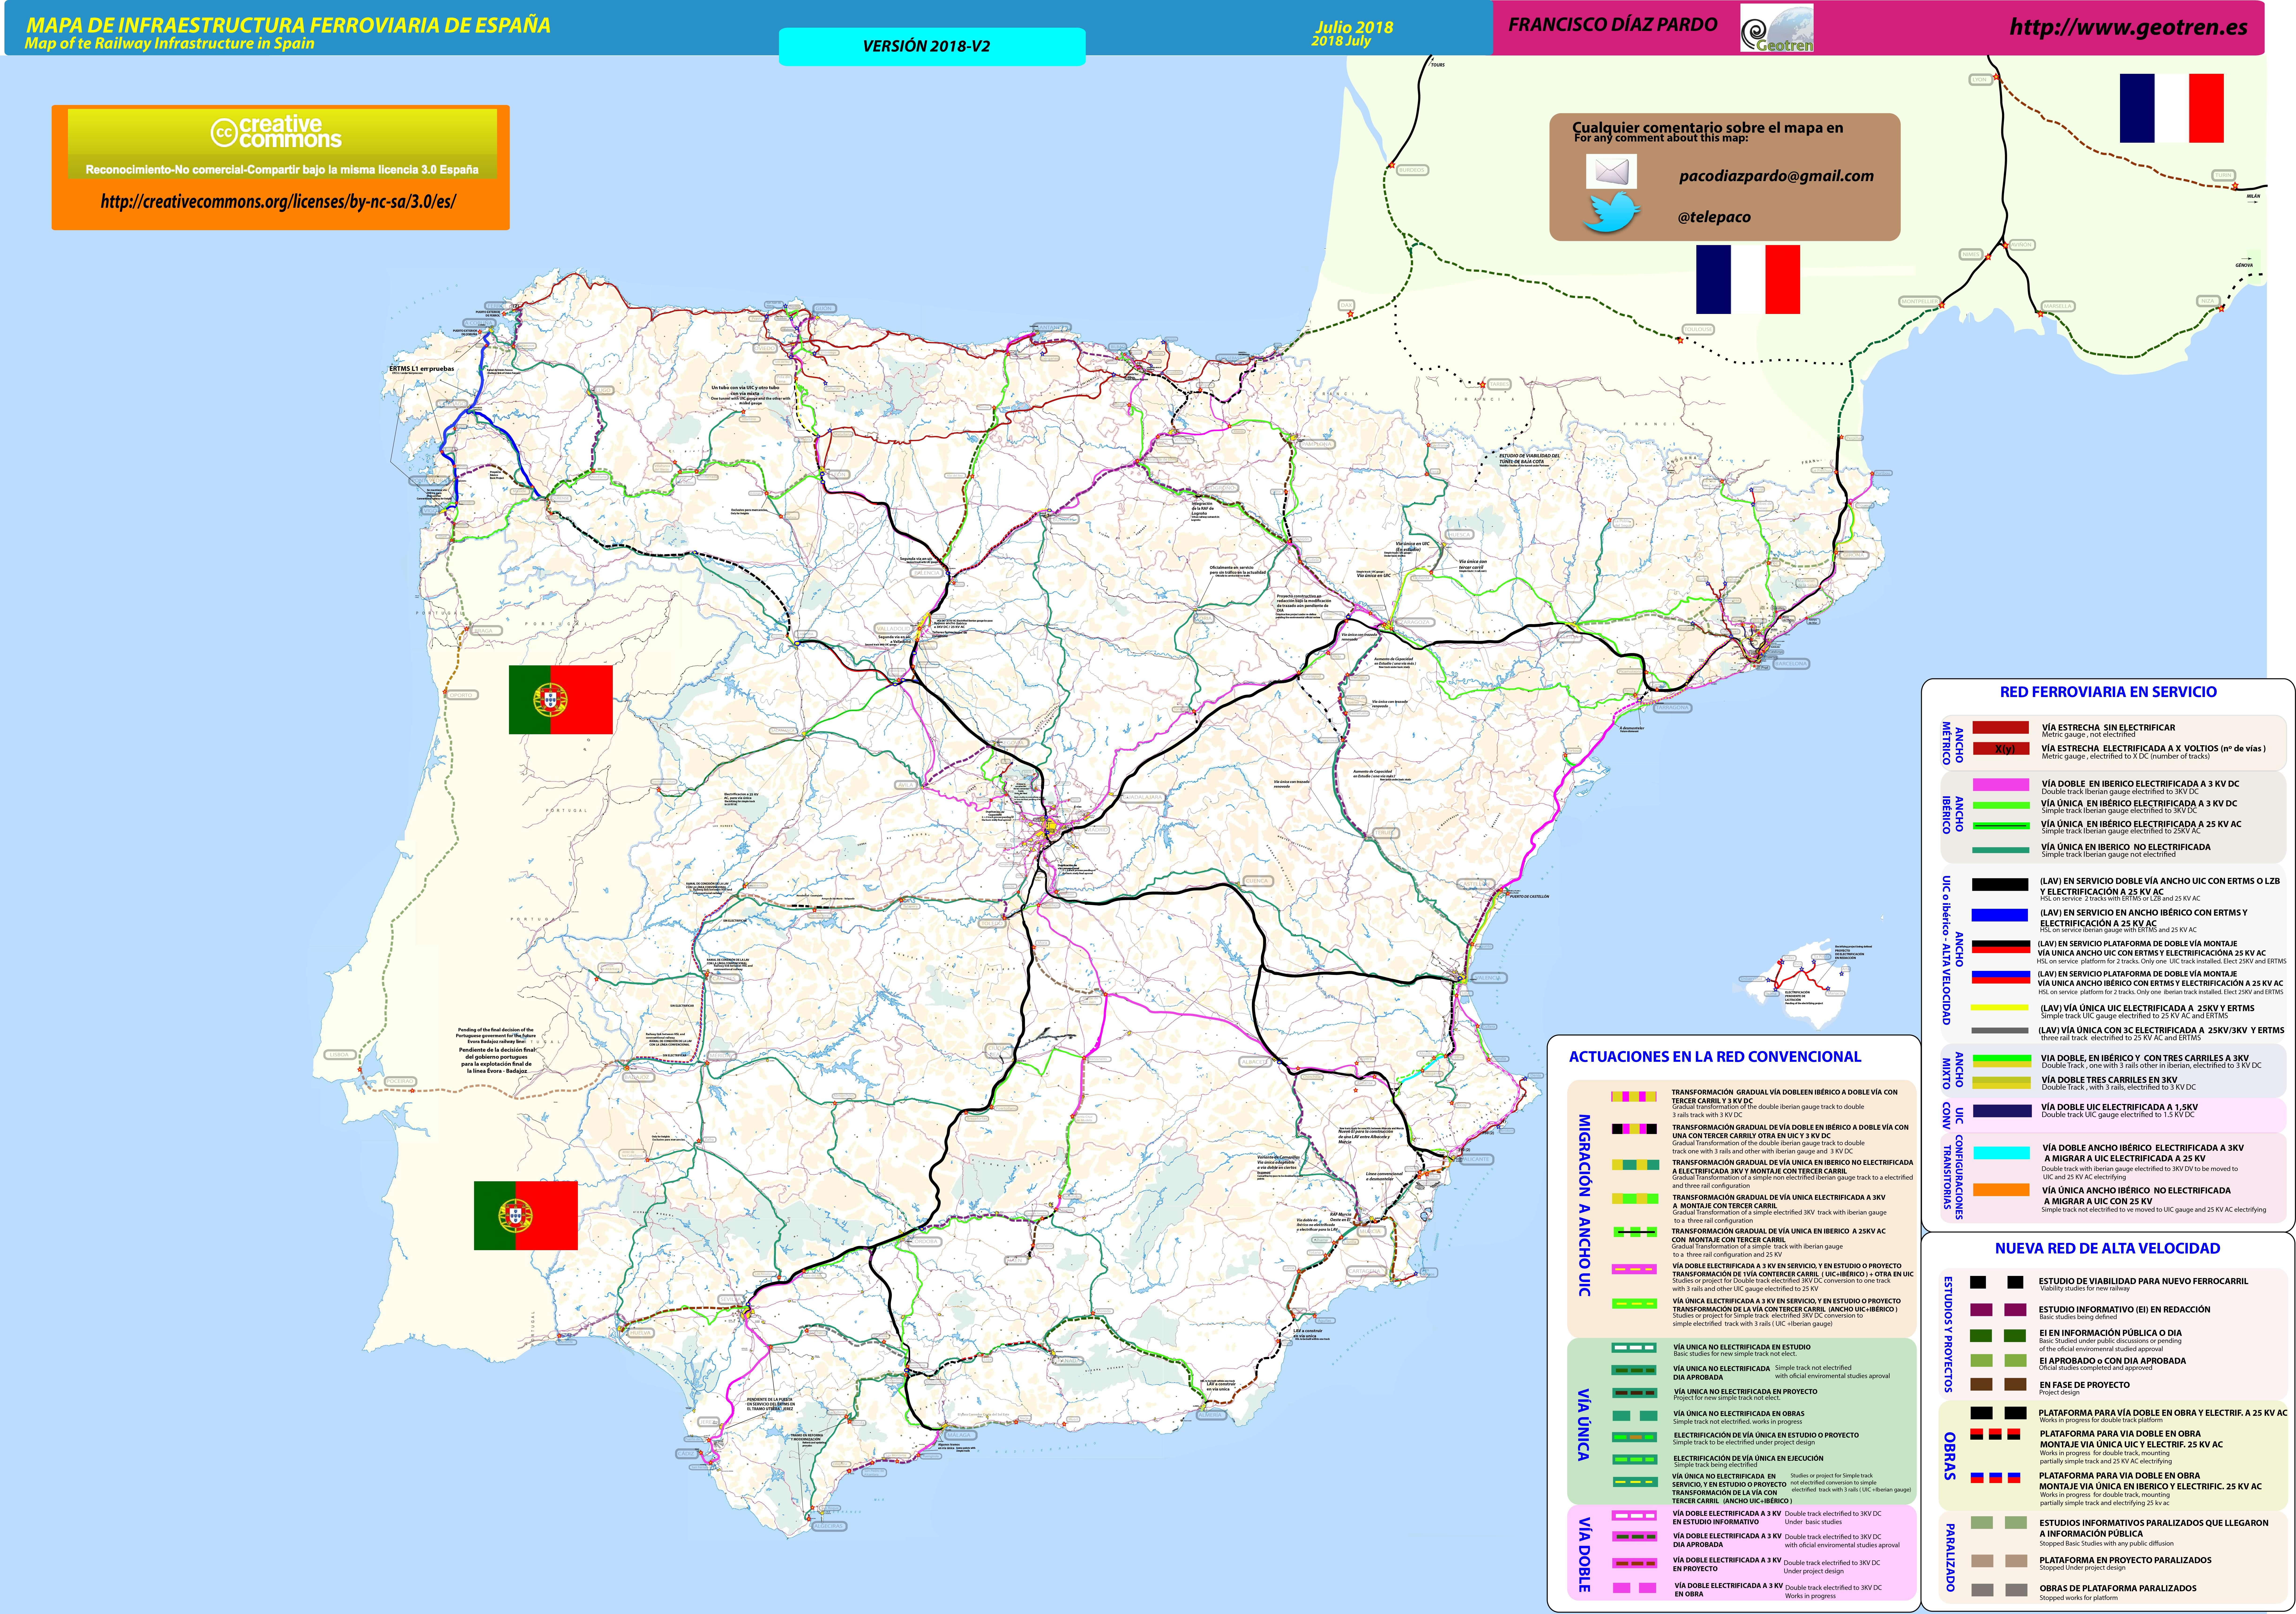 Mapa Ferroviario De España.Nuevo Mapa De Infraestructura Ferroviaria De Espana 2018